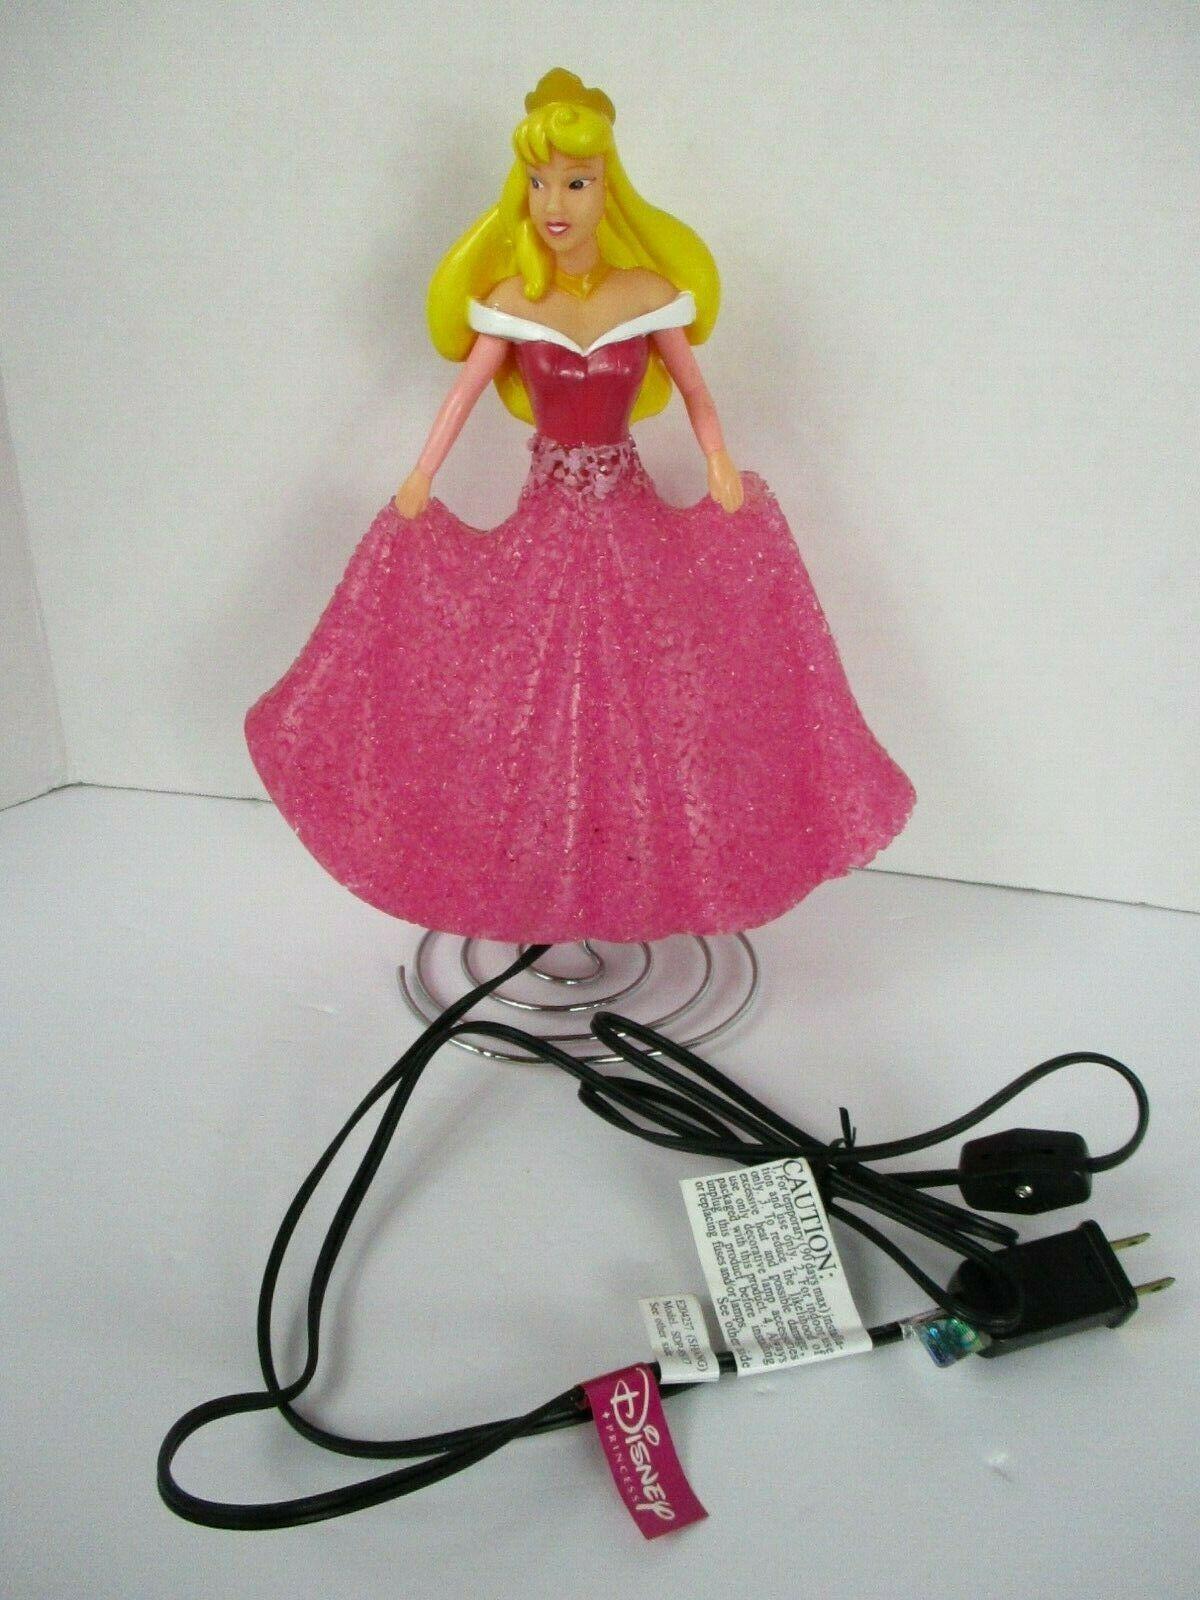 Disney Sleeping Beauty Princess Aurora Lamp Night Light 11 Inch Pink Dress